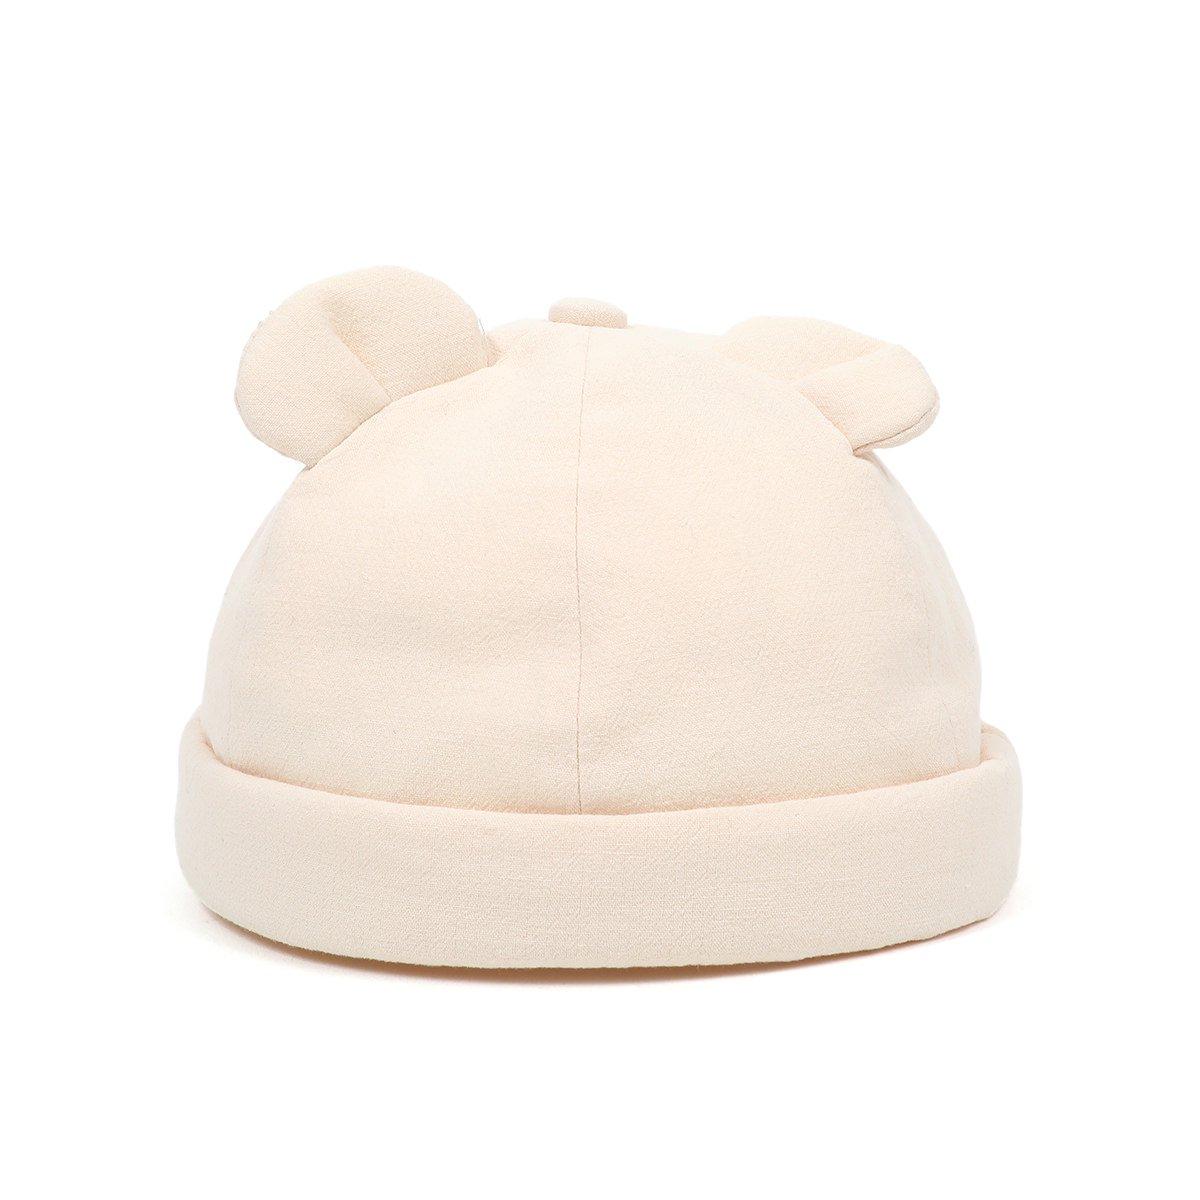 【BABY】Baby Linen Bear Cap 詳細画像2